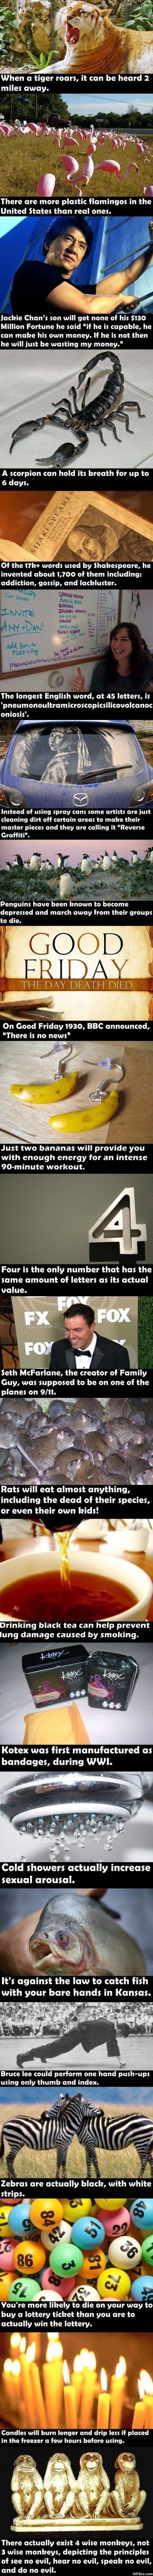 funny-pics-fun-facts-meme